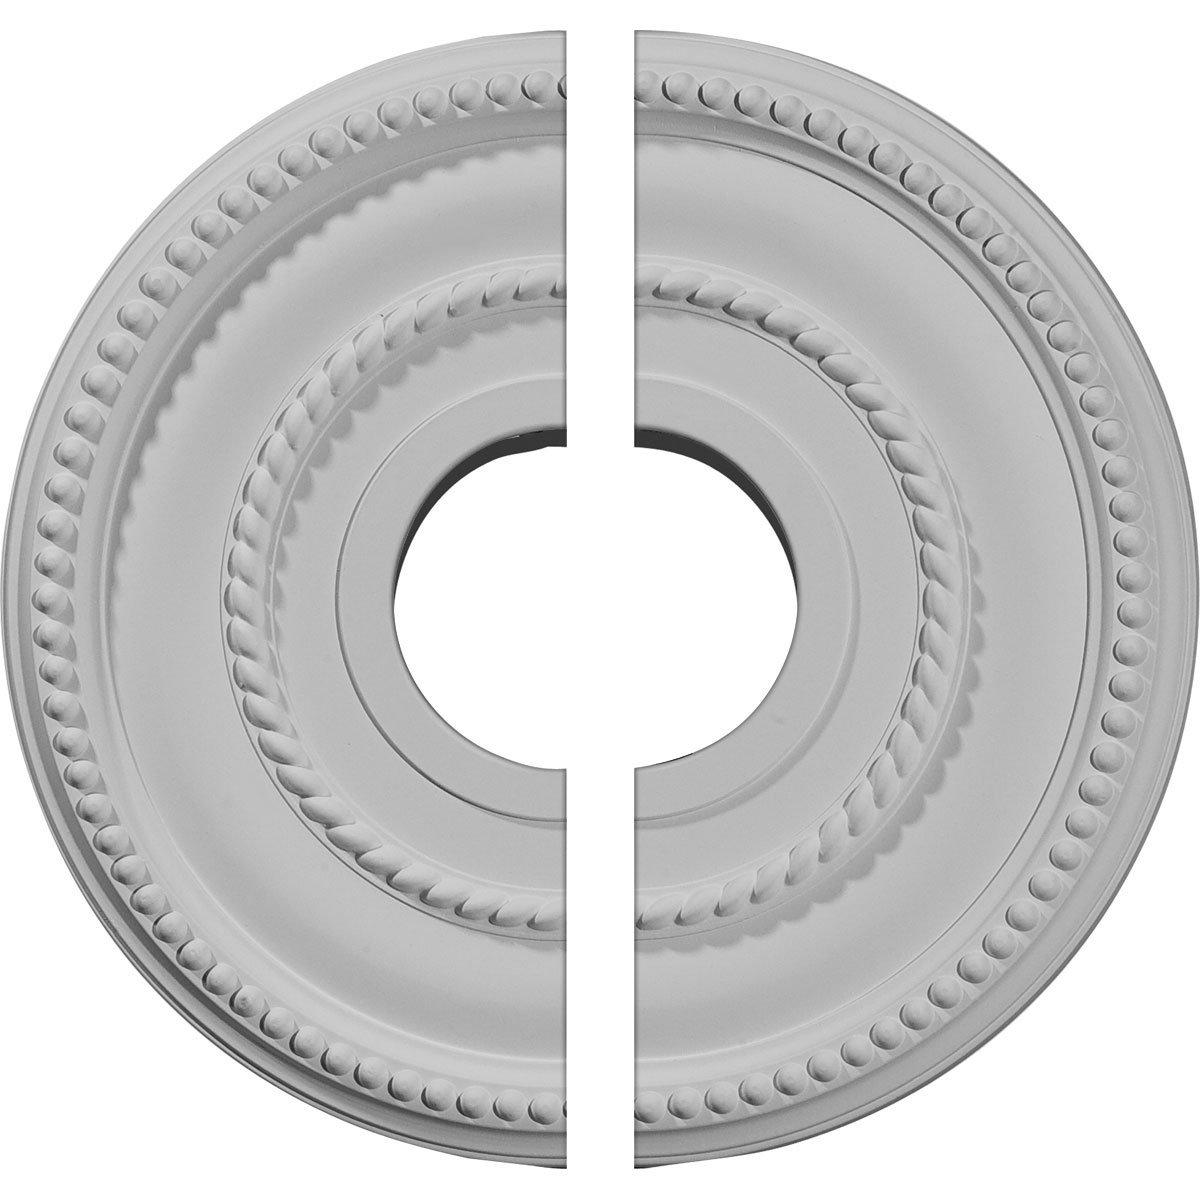 Ekena Millwork CM12VA2 12 1/8''OD x 3 5/8''ID x 3/4''P Valeriano Ceiling Medallion, Fits Canopies up to 6-1/4'', 2 Piece by Ekena Millwork